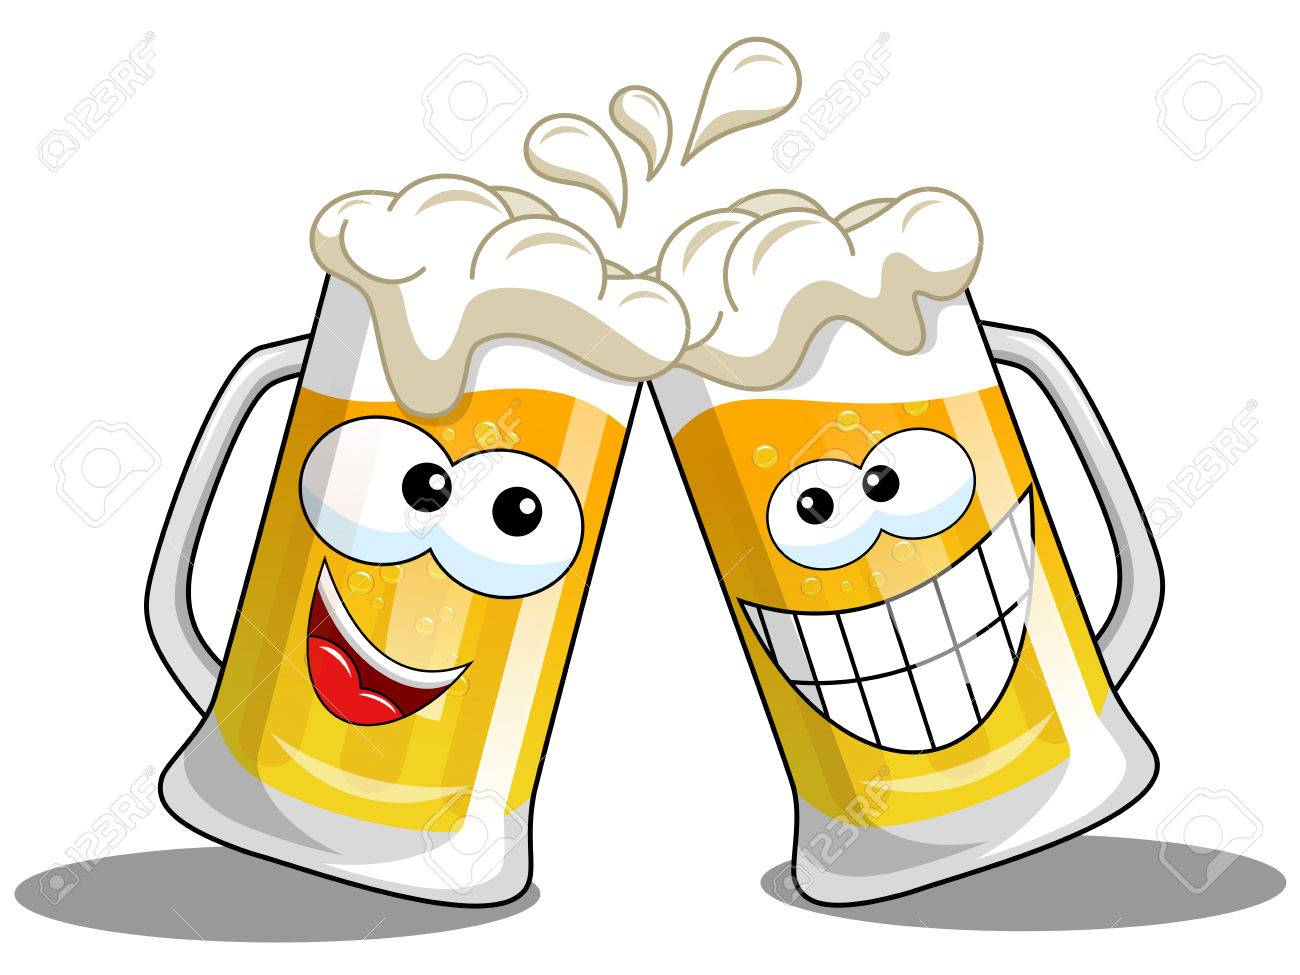 Cartoon beer mug making cheers isolated on white - 72377520